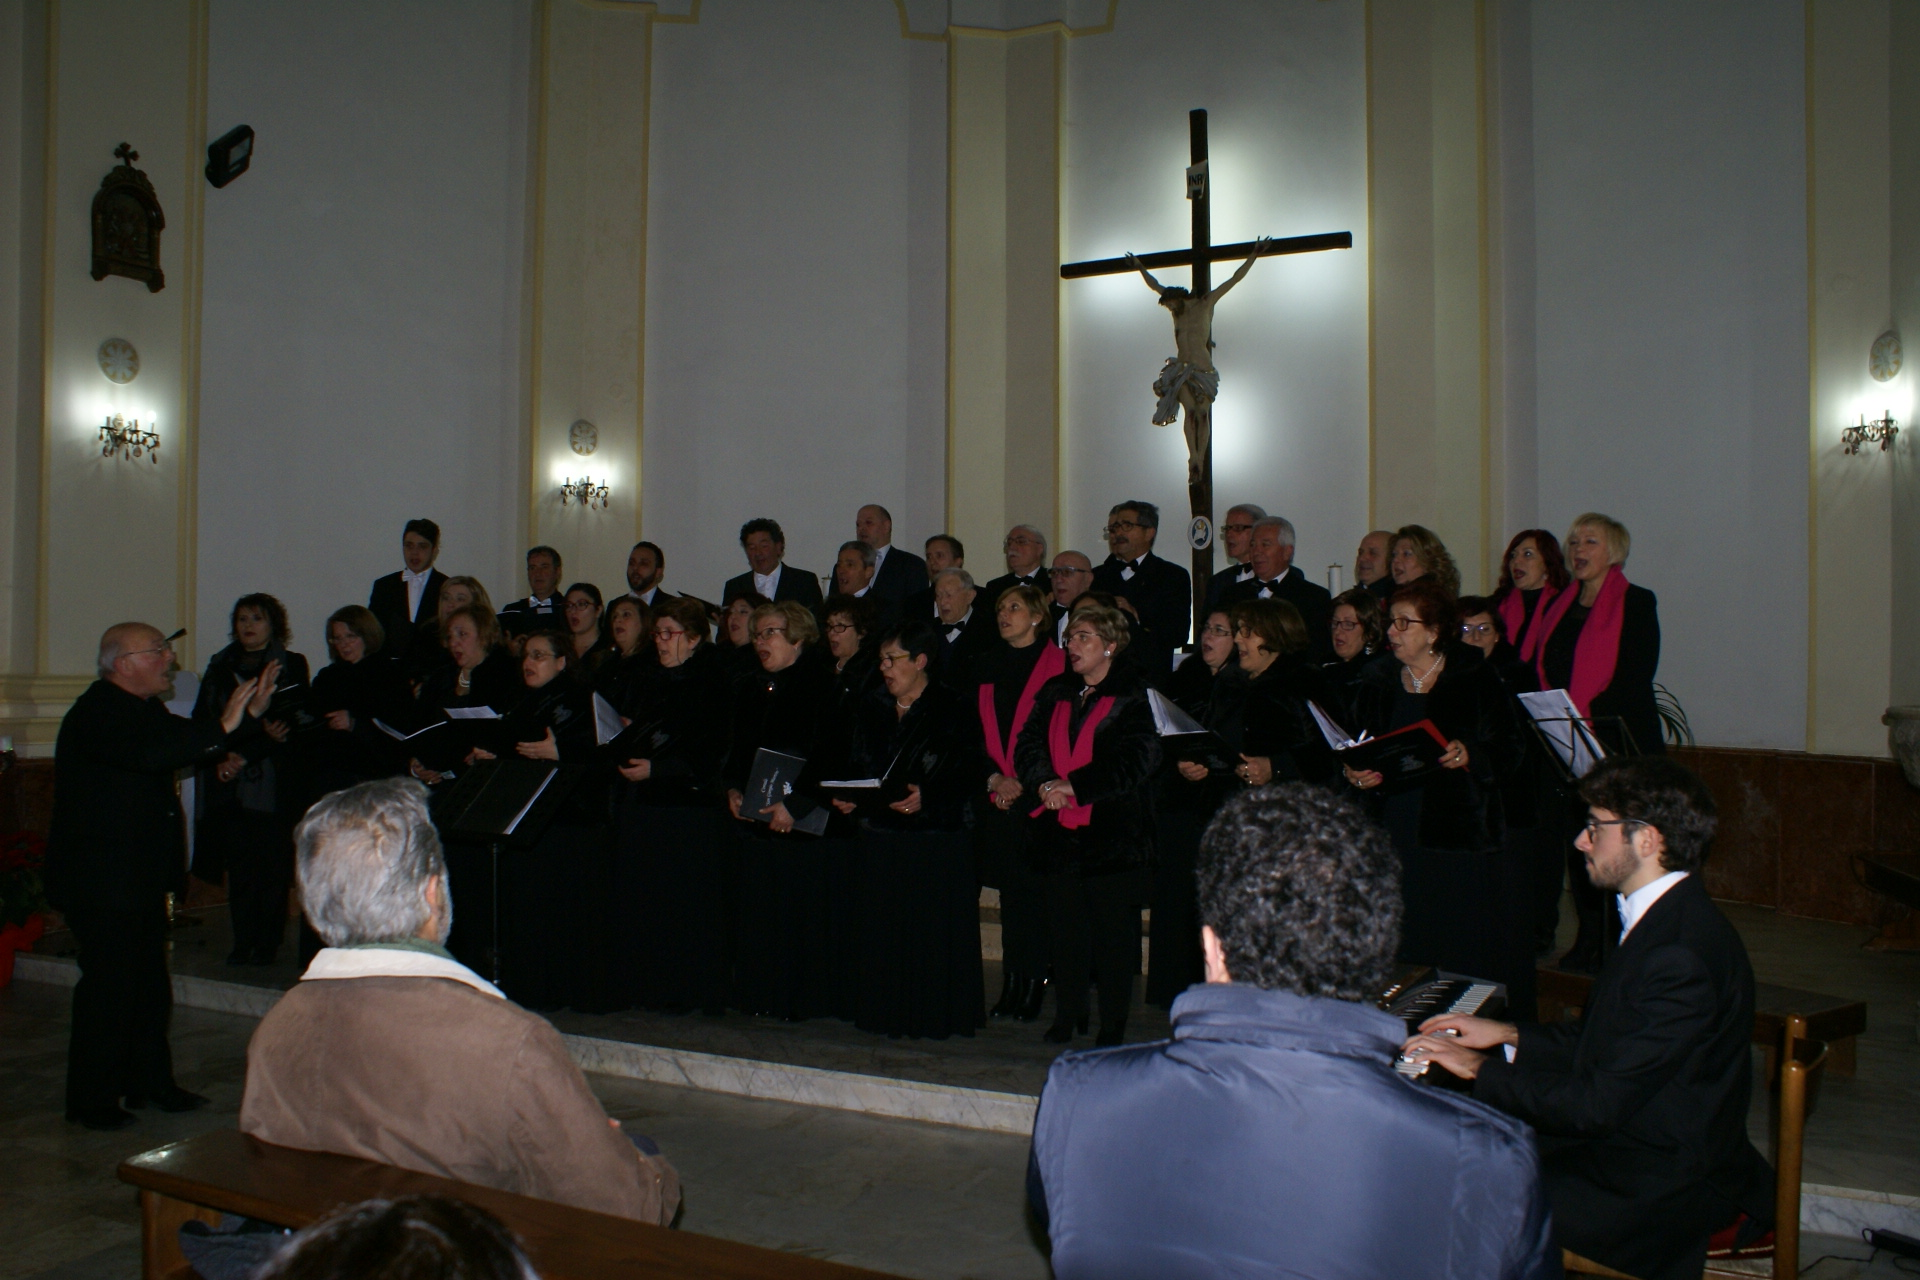 concerto San Giorgio 039